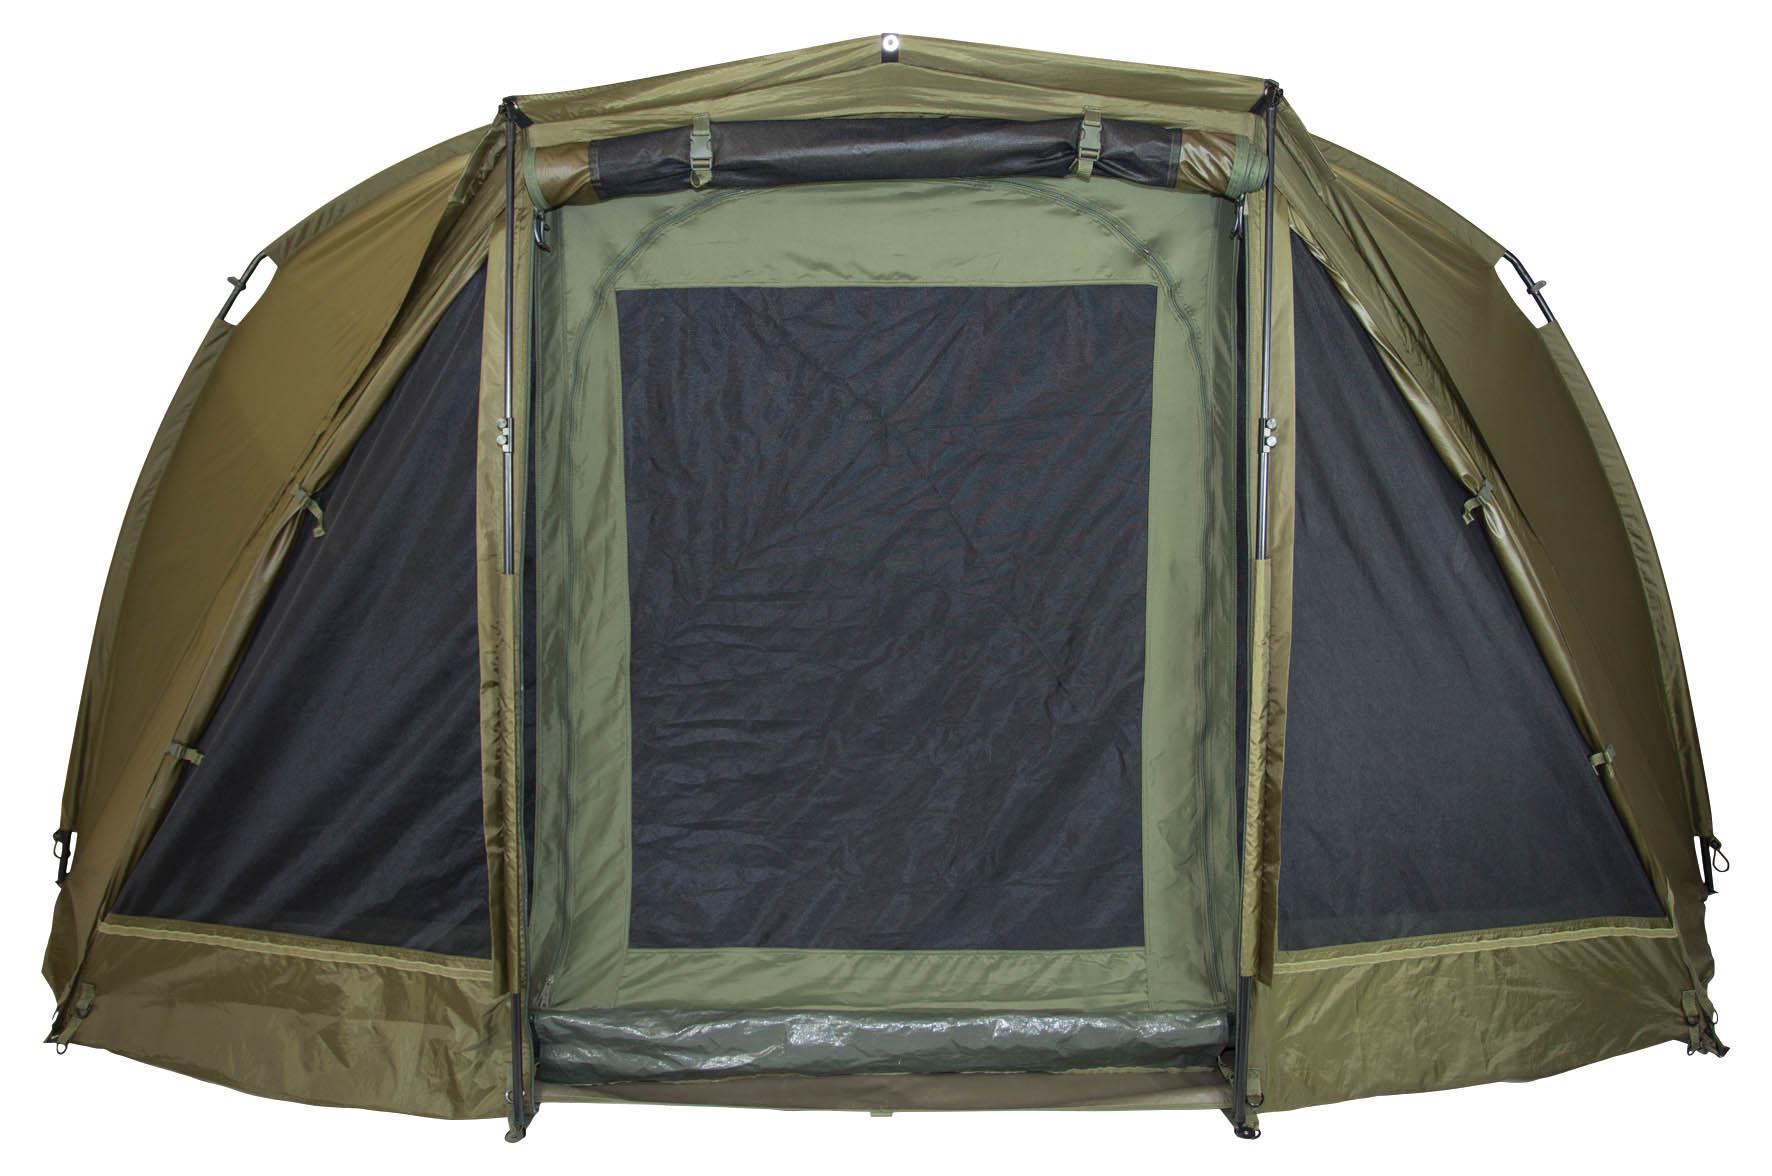 201547 Trakker Tempest 200 Shelter